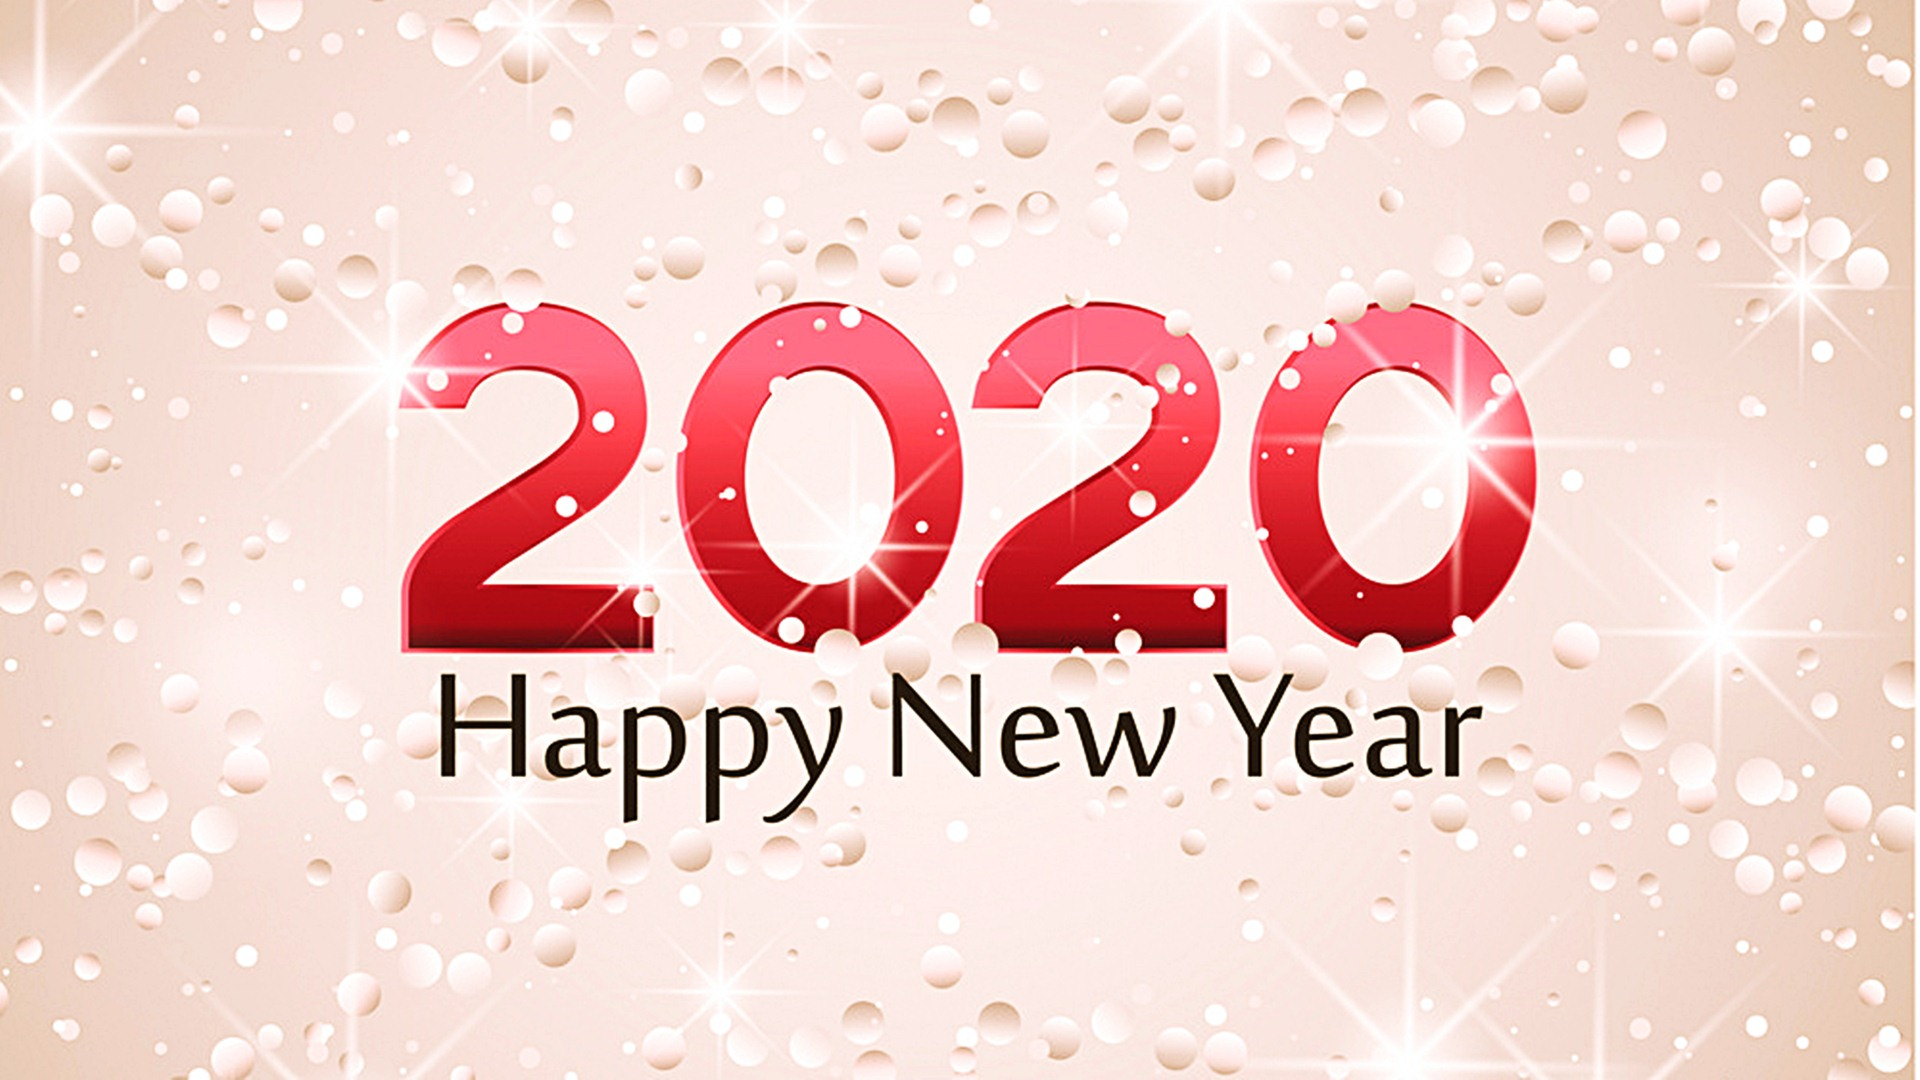 download Happy New Year 2020 Wallpaper HD 45554 Baltana 1920x1080